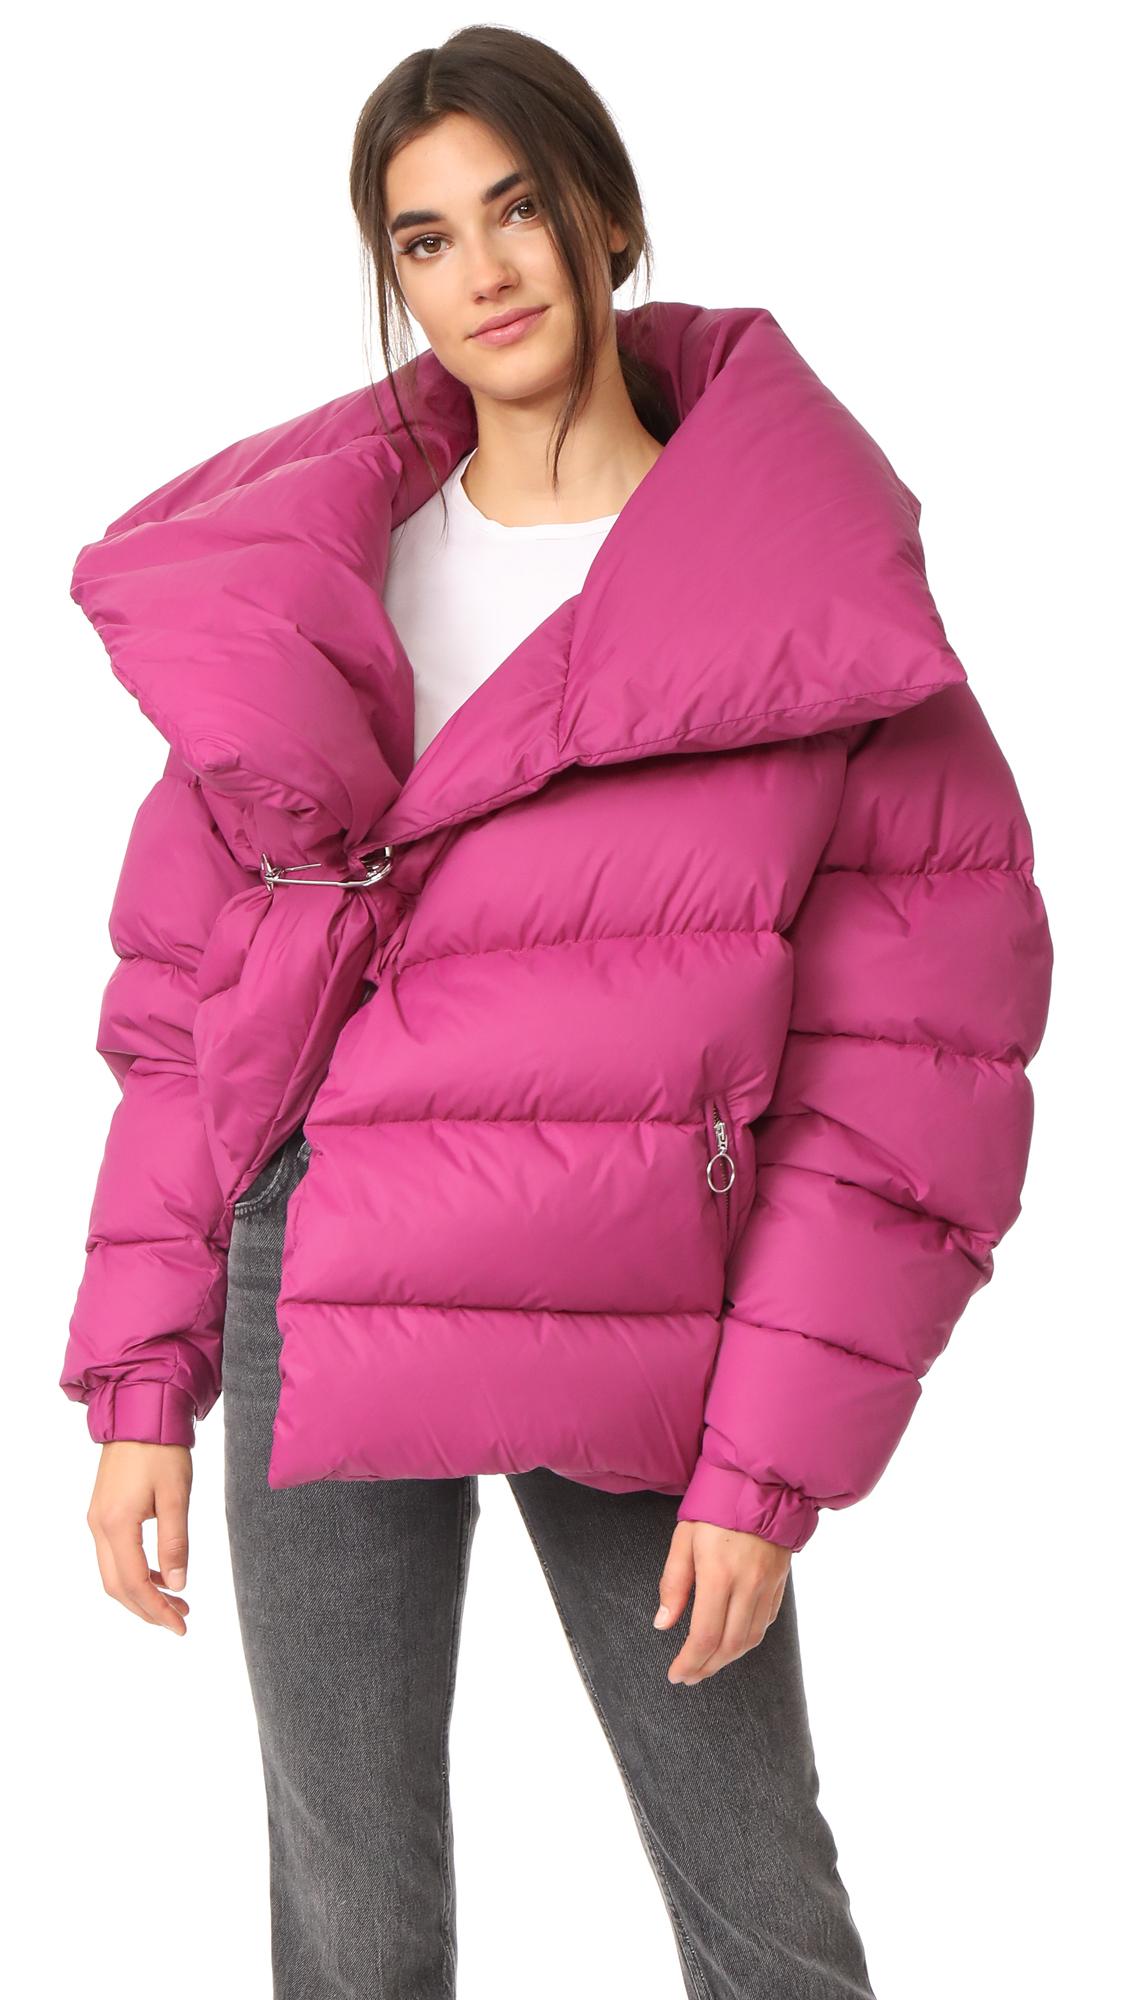 Oversized pink puffer jacket